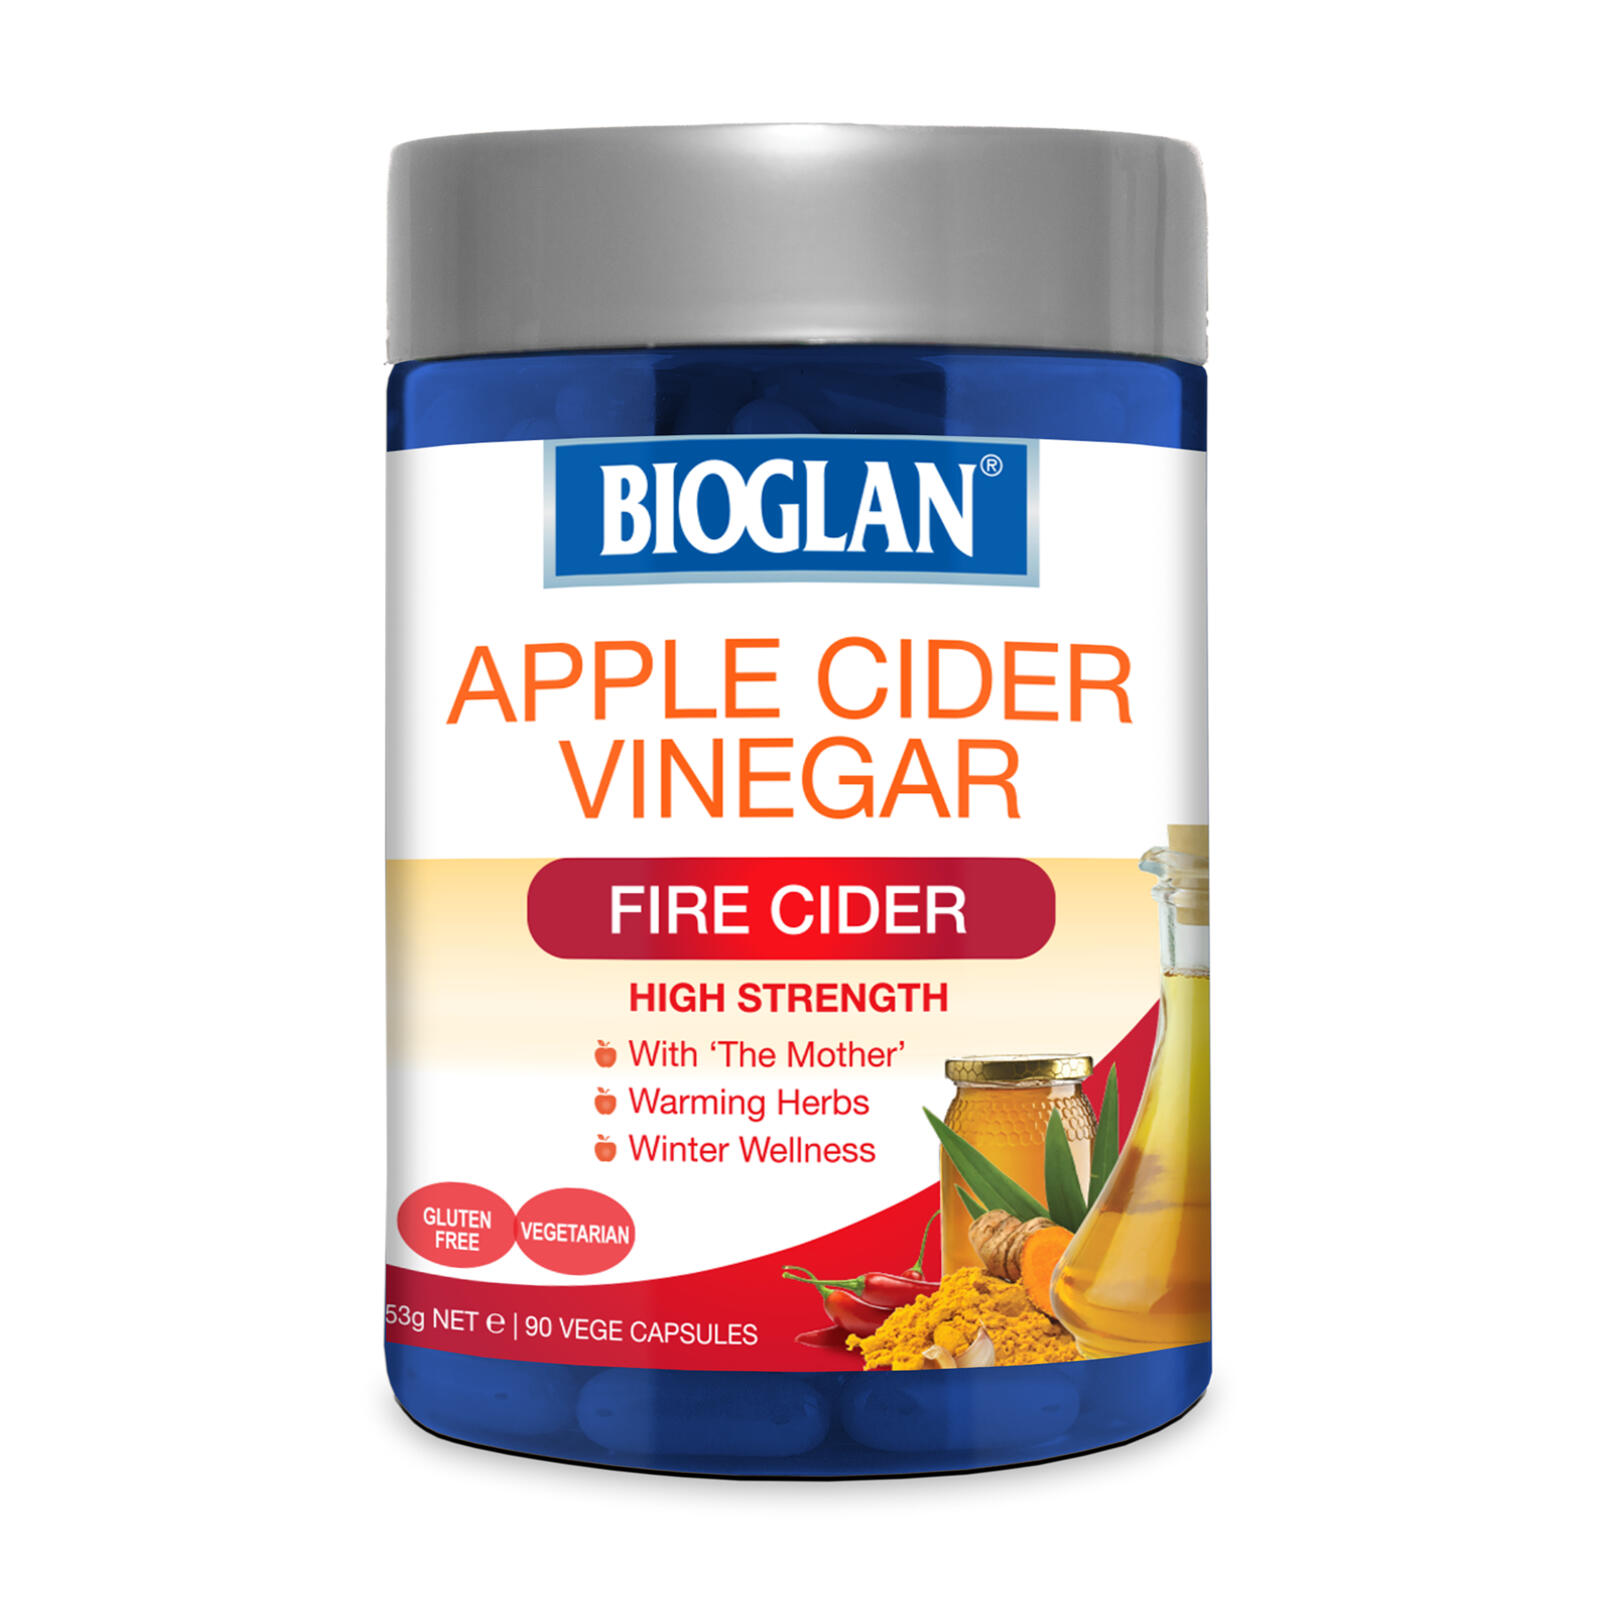 Buy Bioglan Apple Cider Vinegar Fire Cider 90 Capsules | Liver & Detox, Vitamins | Online